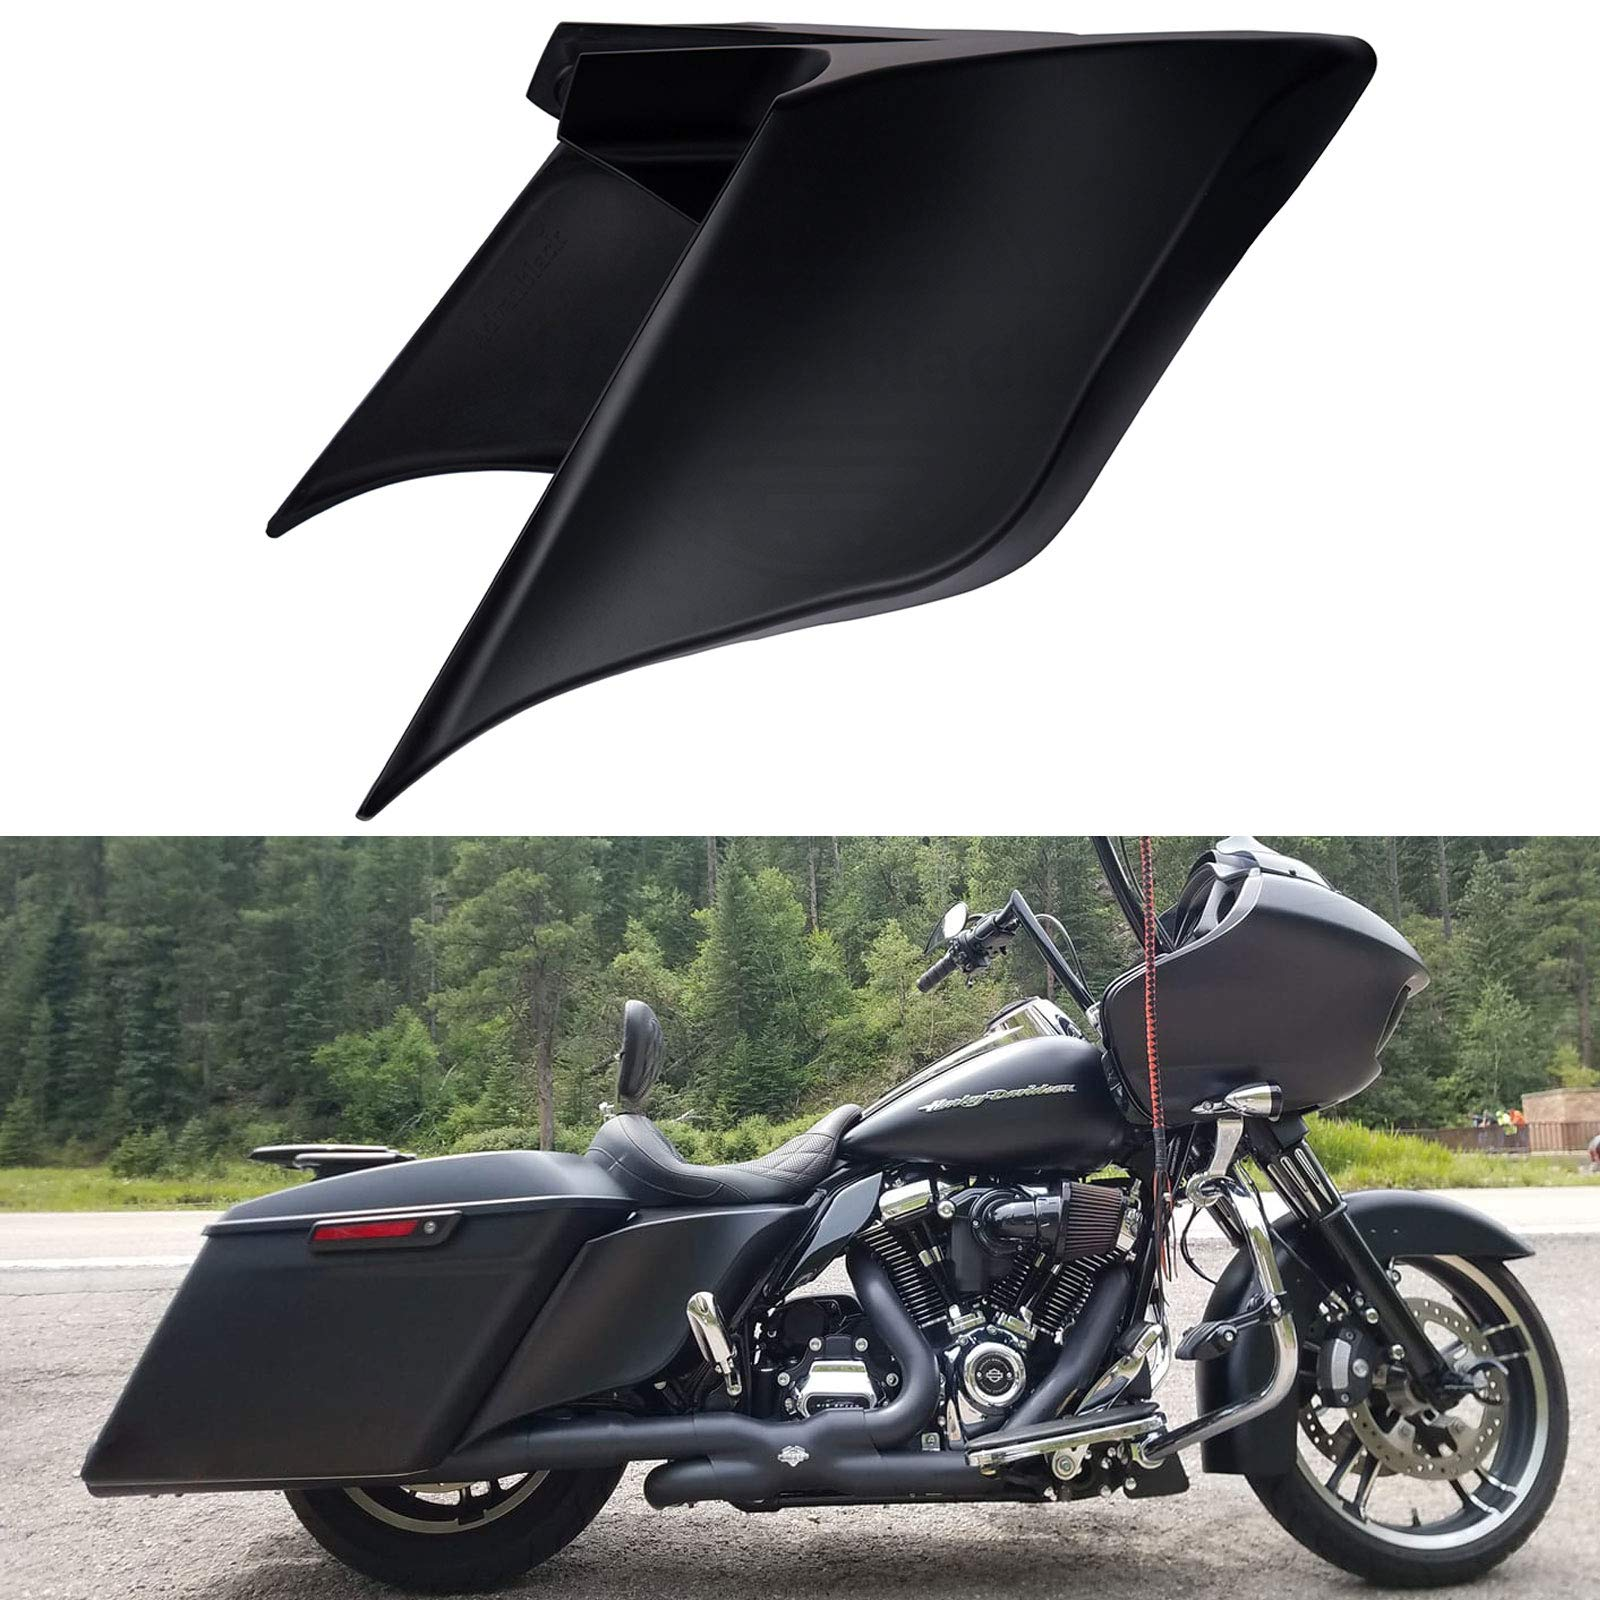 US STOCK! Advanblack Denim/Matte Black Extended Side Covers Stretched Panels Fit for Harley Davidson Touring Street Glide Road Glide 2014 2015 2016 2017 2018 2019